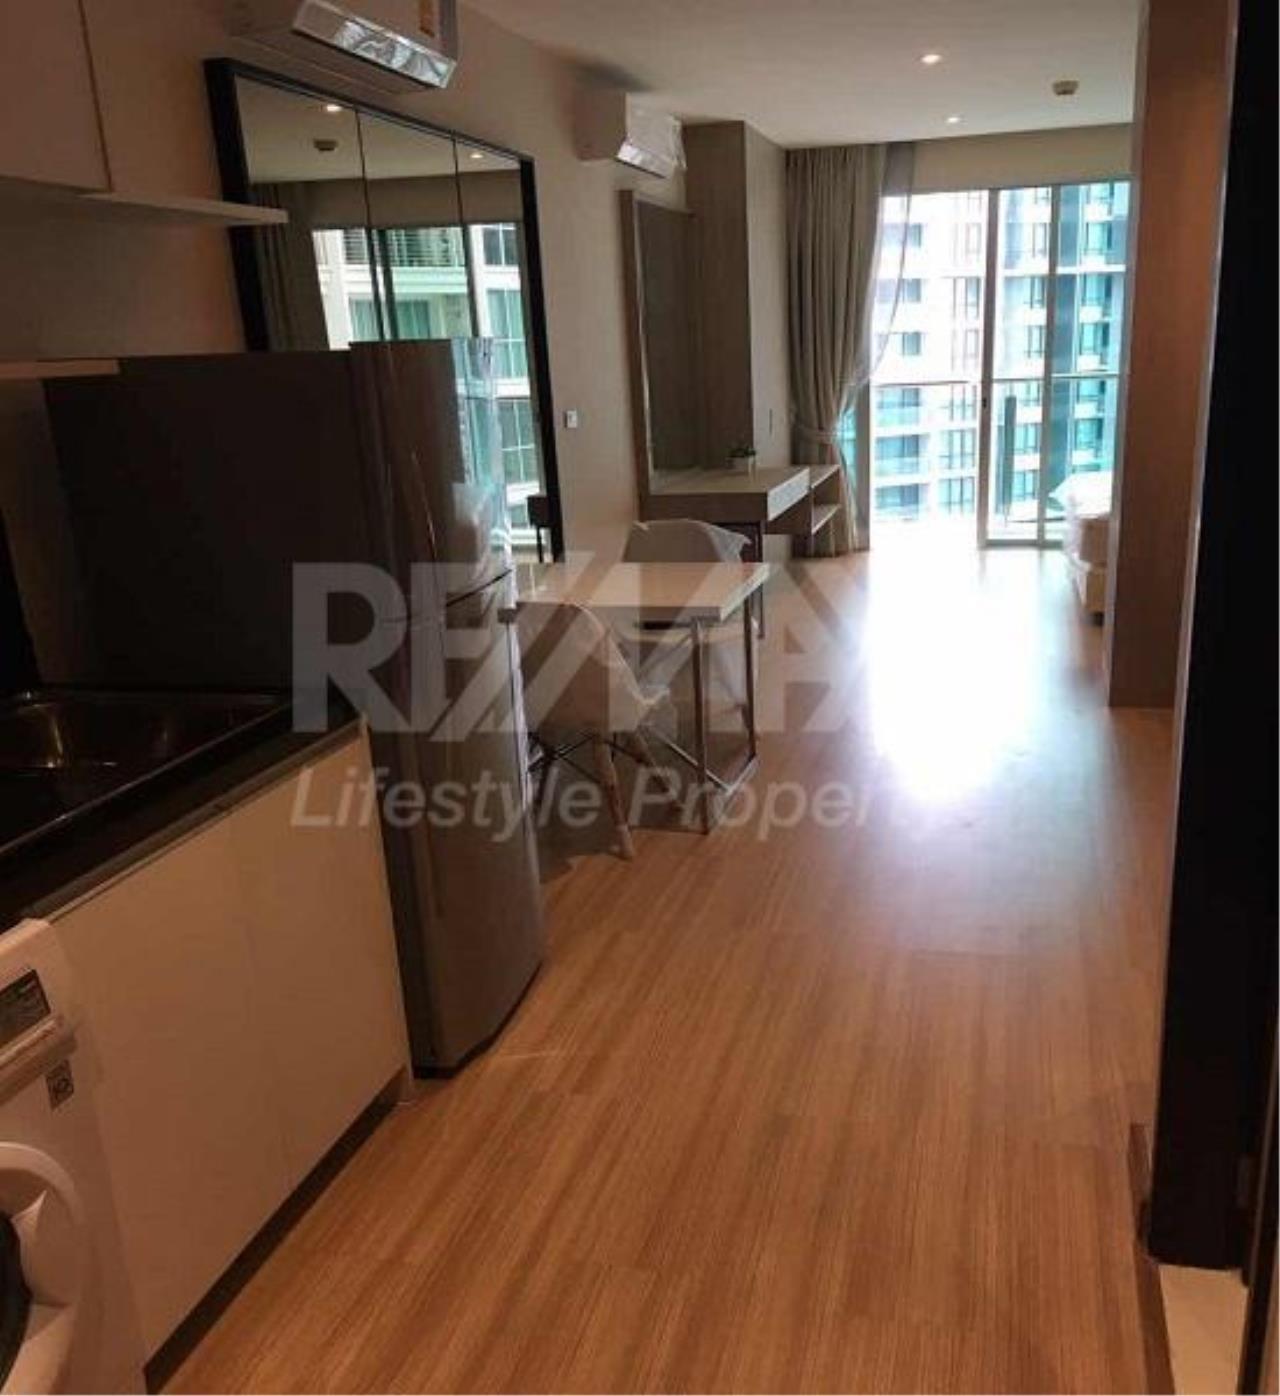 RE/MAX LifeStyle Property Agency's Sky Walk Condominium 14